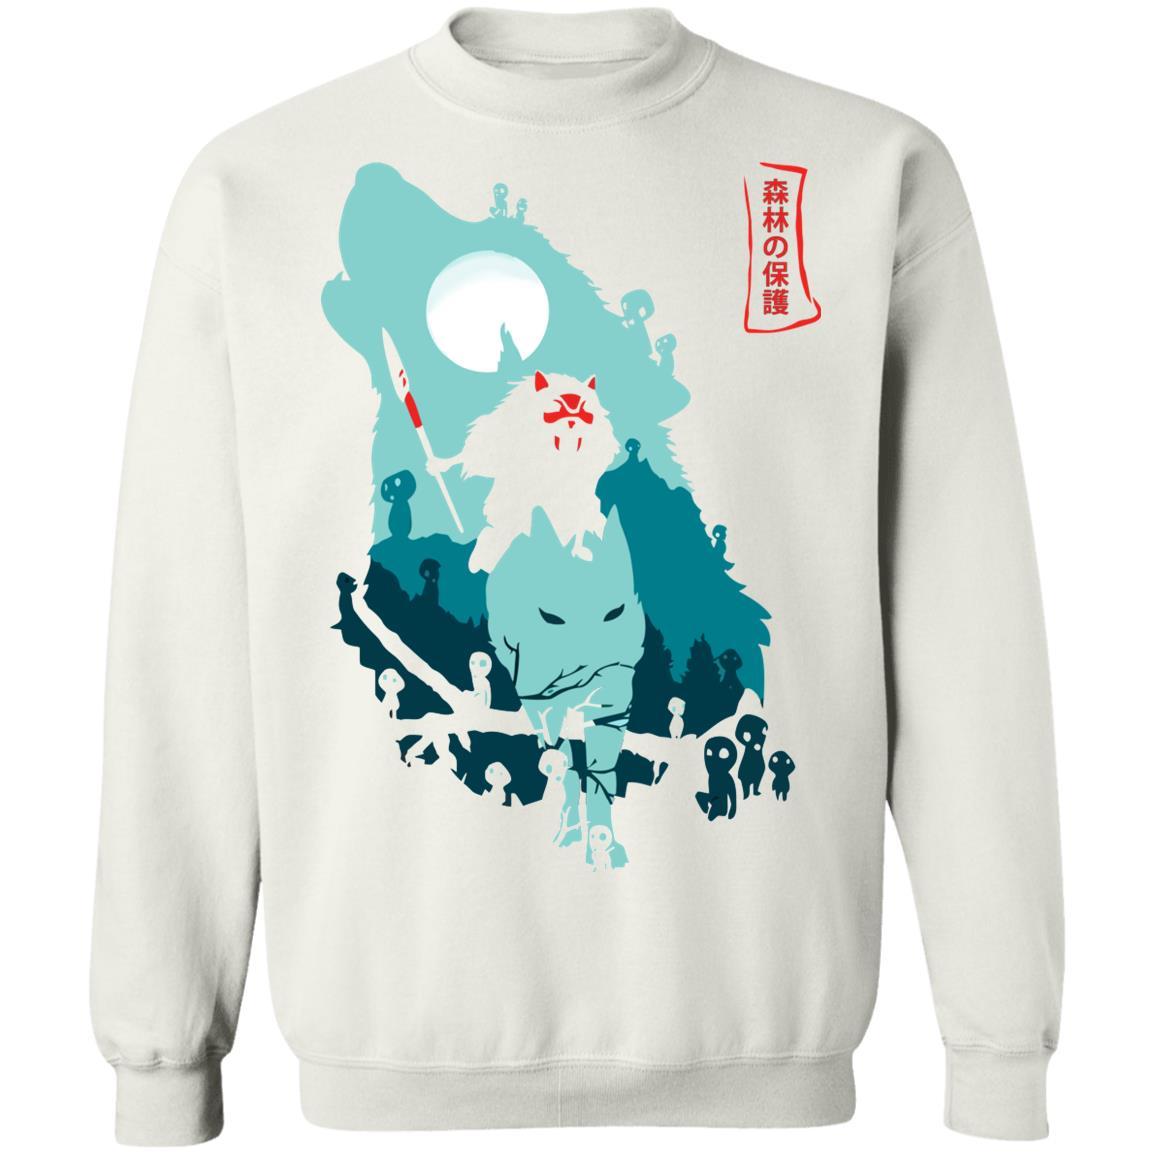 Princess Mononoke – Guardians of the Forest Sweatshirt Unisex